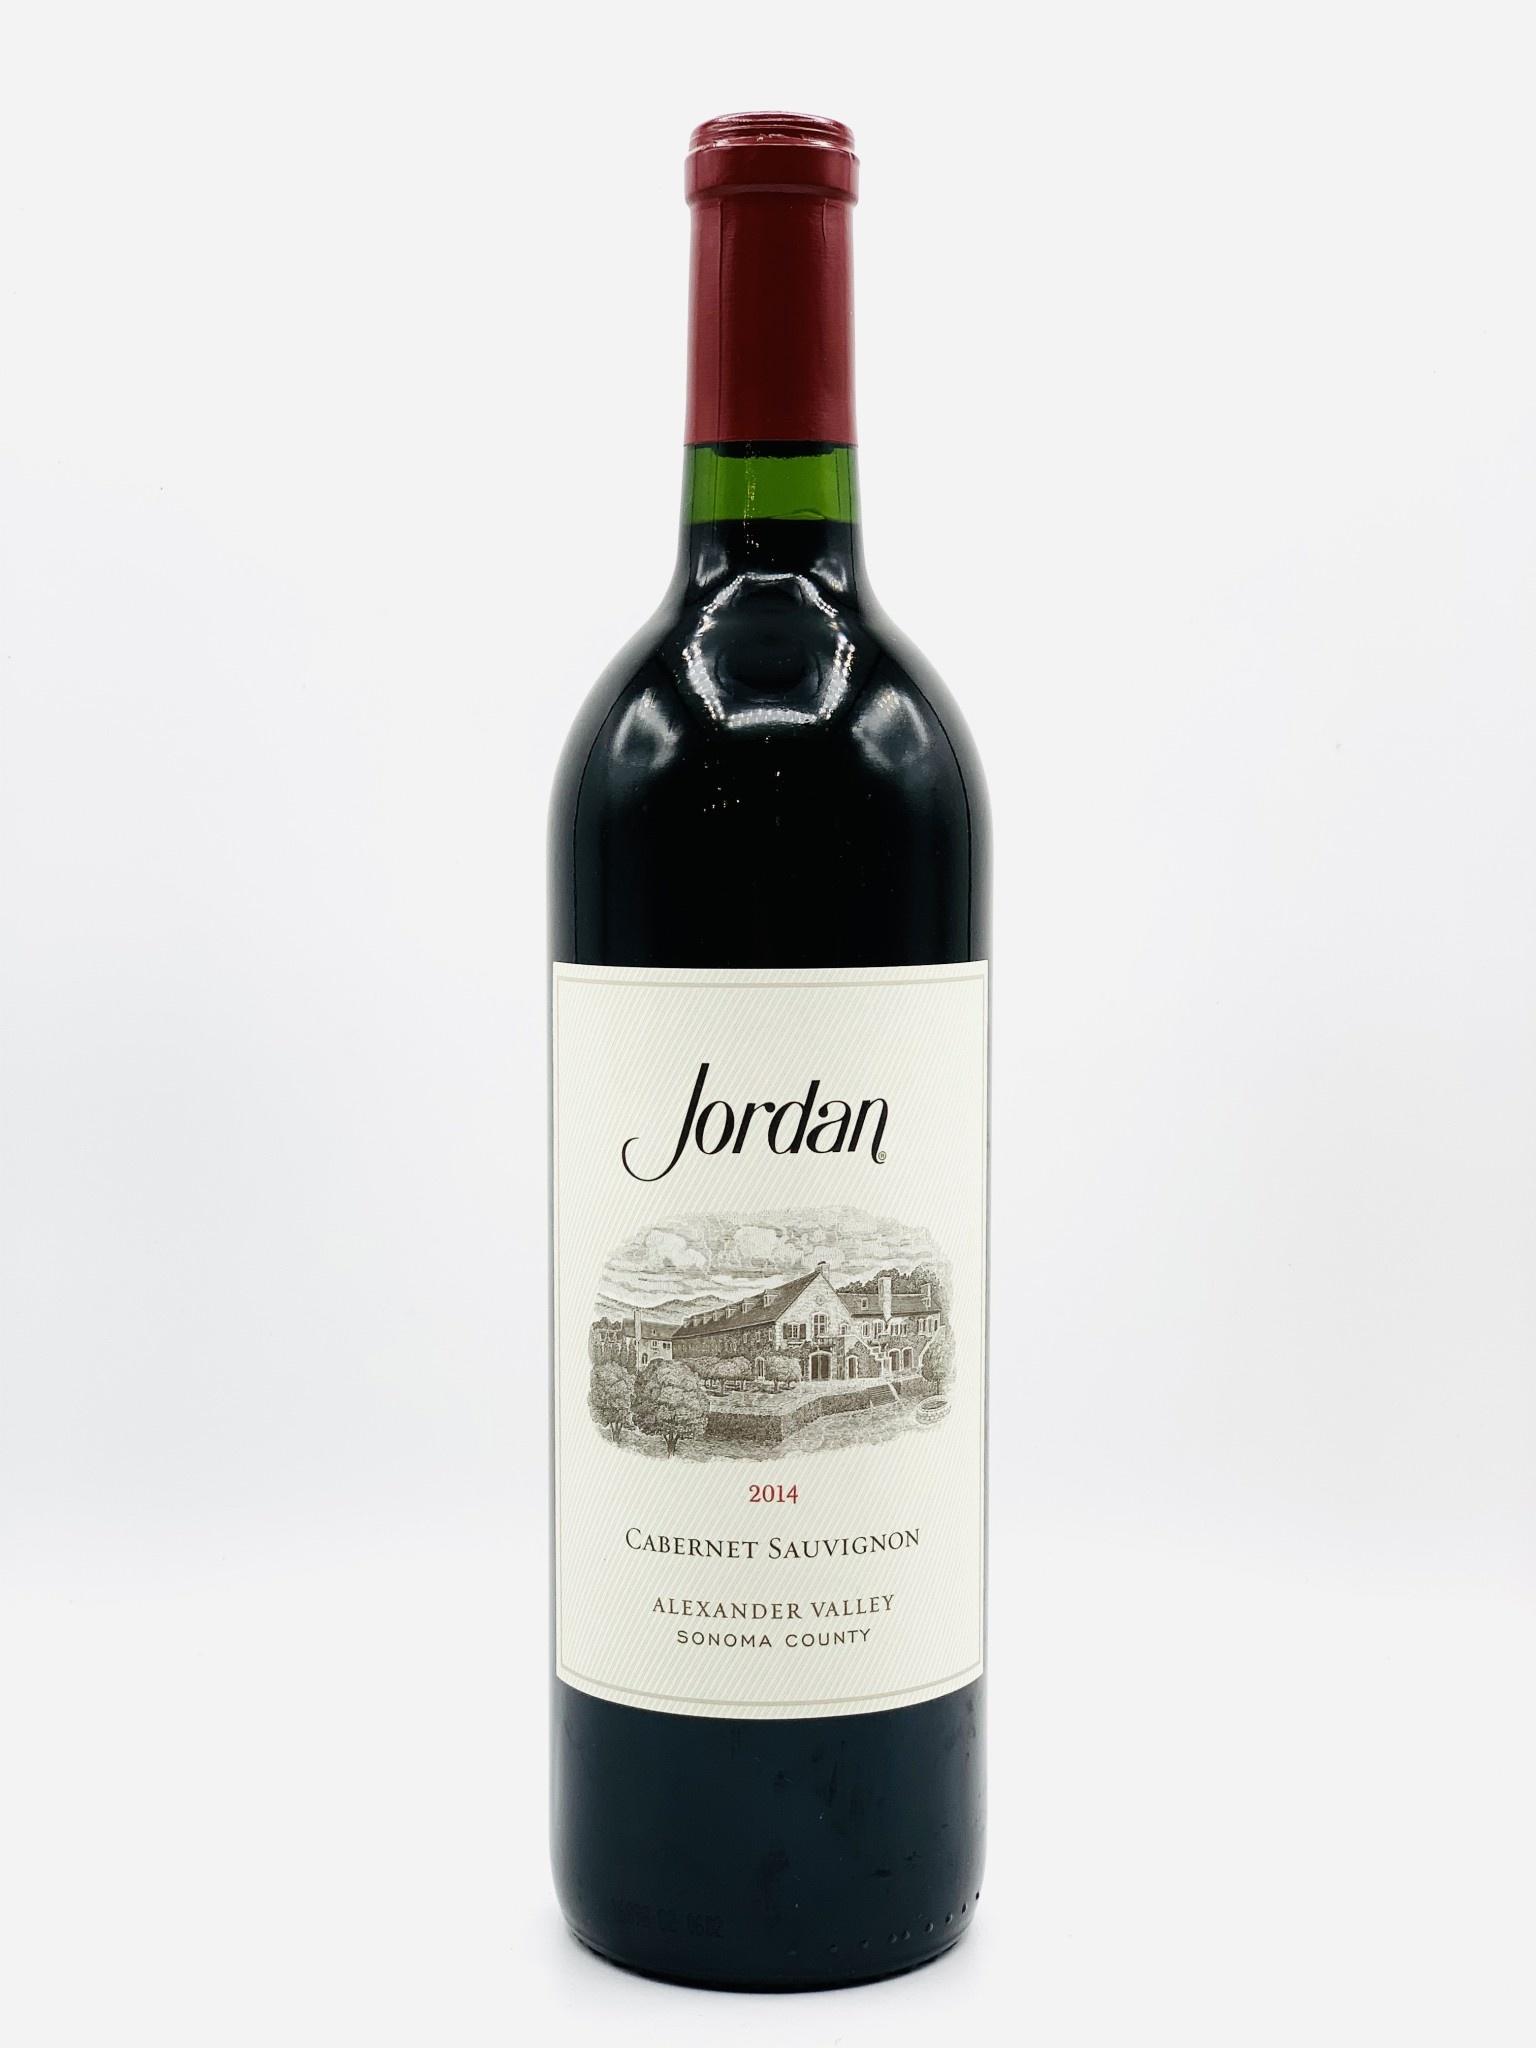 Alexander Valley Cabernet Sauvignon 2014 Jordan Winery  750ml